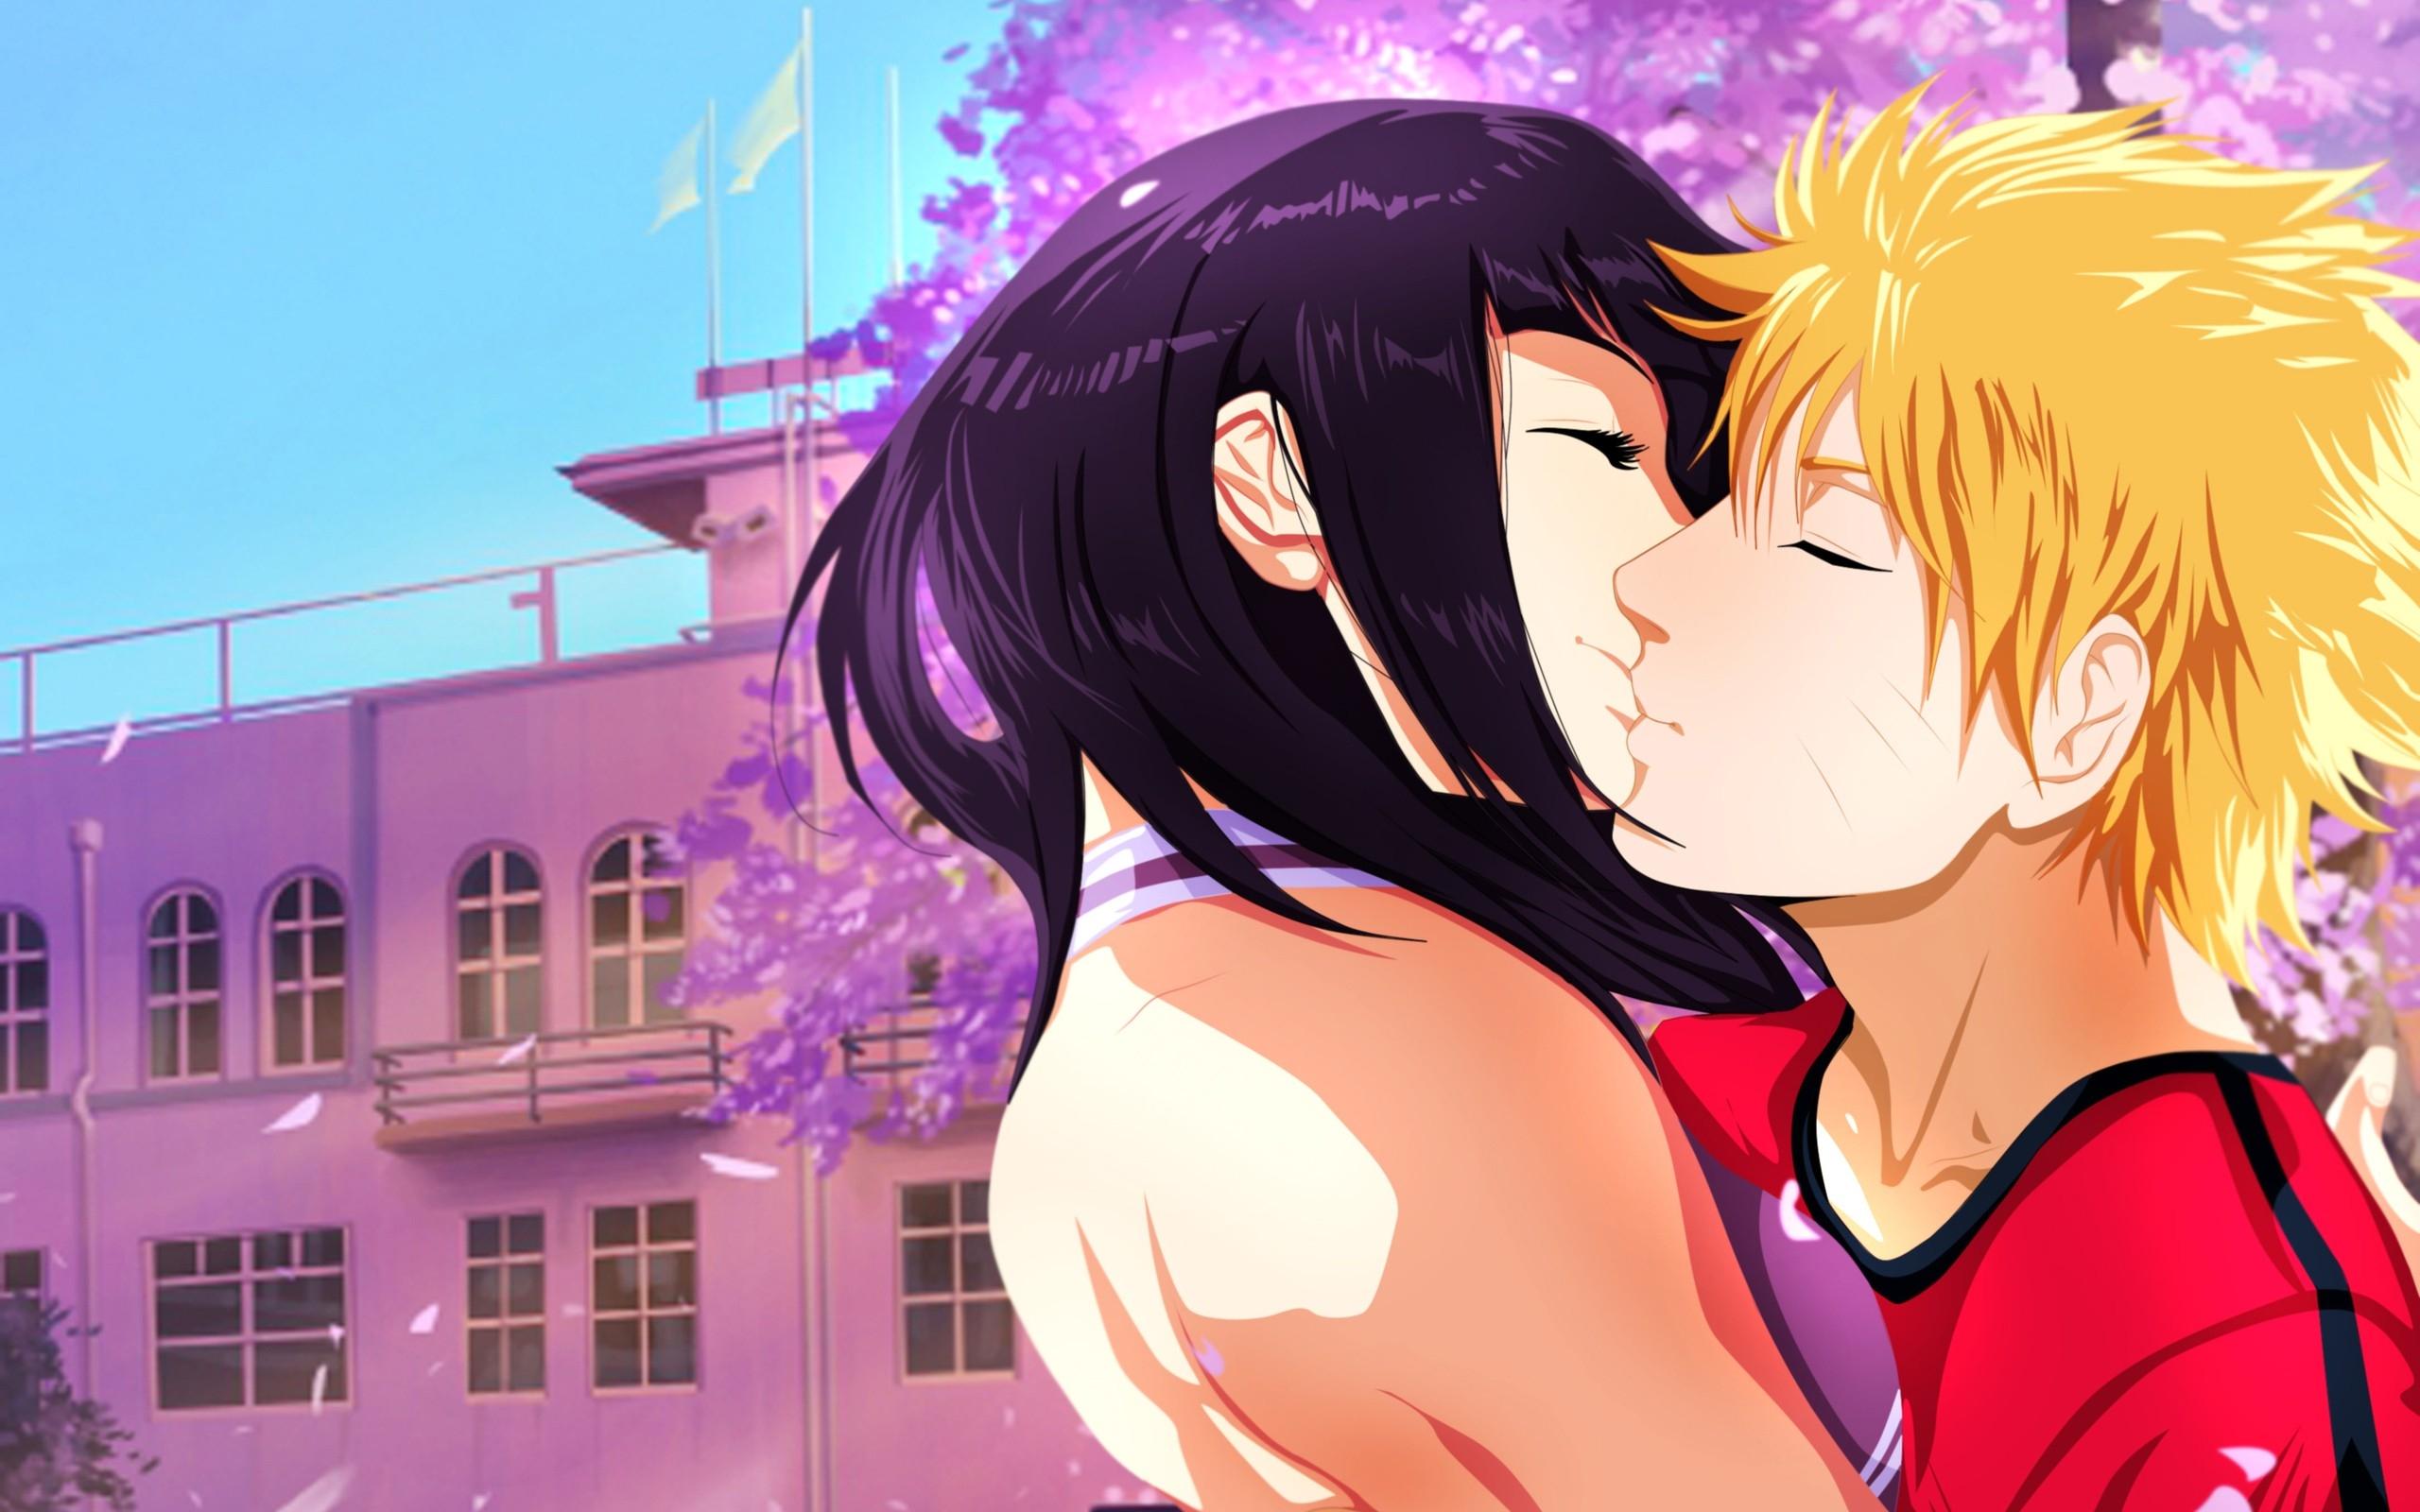 Good Wallpaper Naruto Couple - naruto-hinata-hyuga-naruto-uzumaki-kiss-tenderness-building-spring-1053752  Trends_5275.jpg